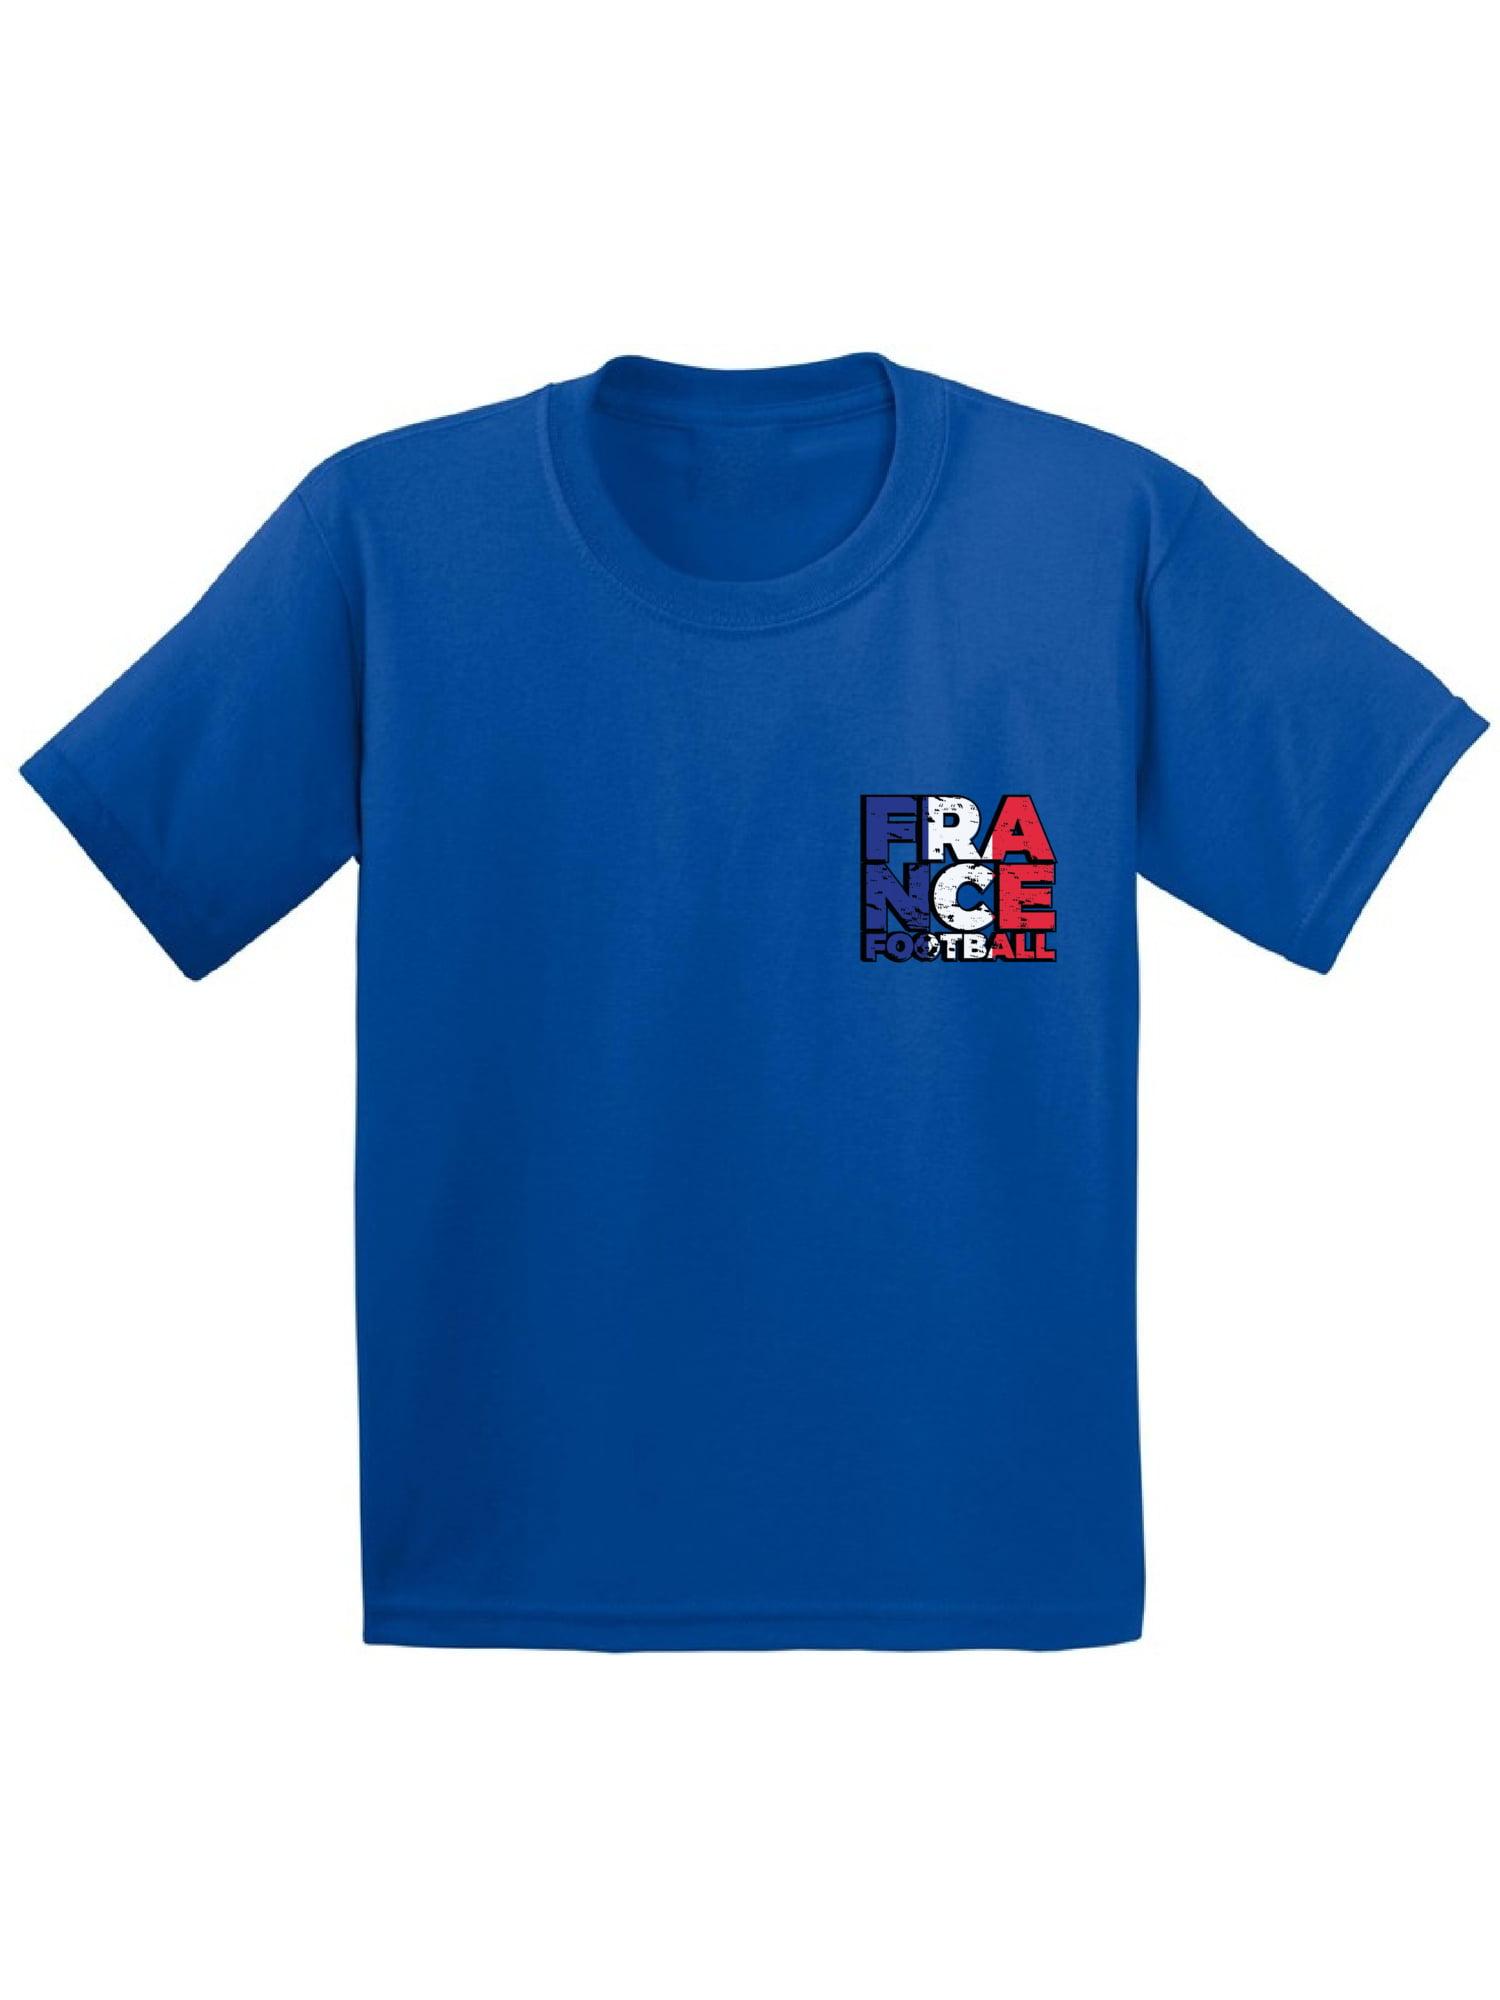 T-Shirts of France Boys Souvenirs of France Paris Flash T-Shirt